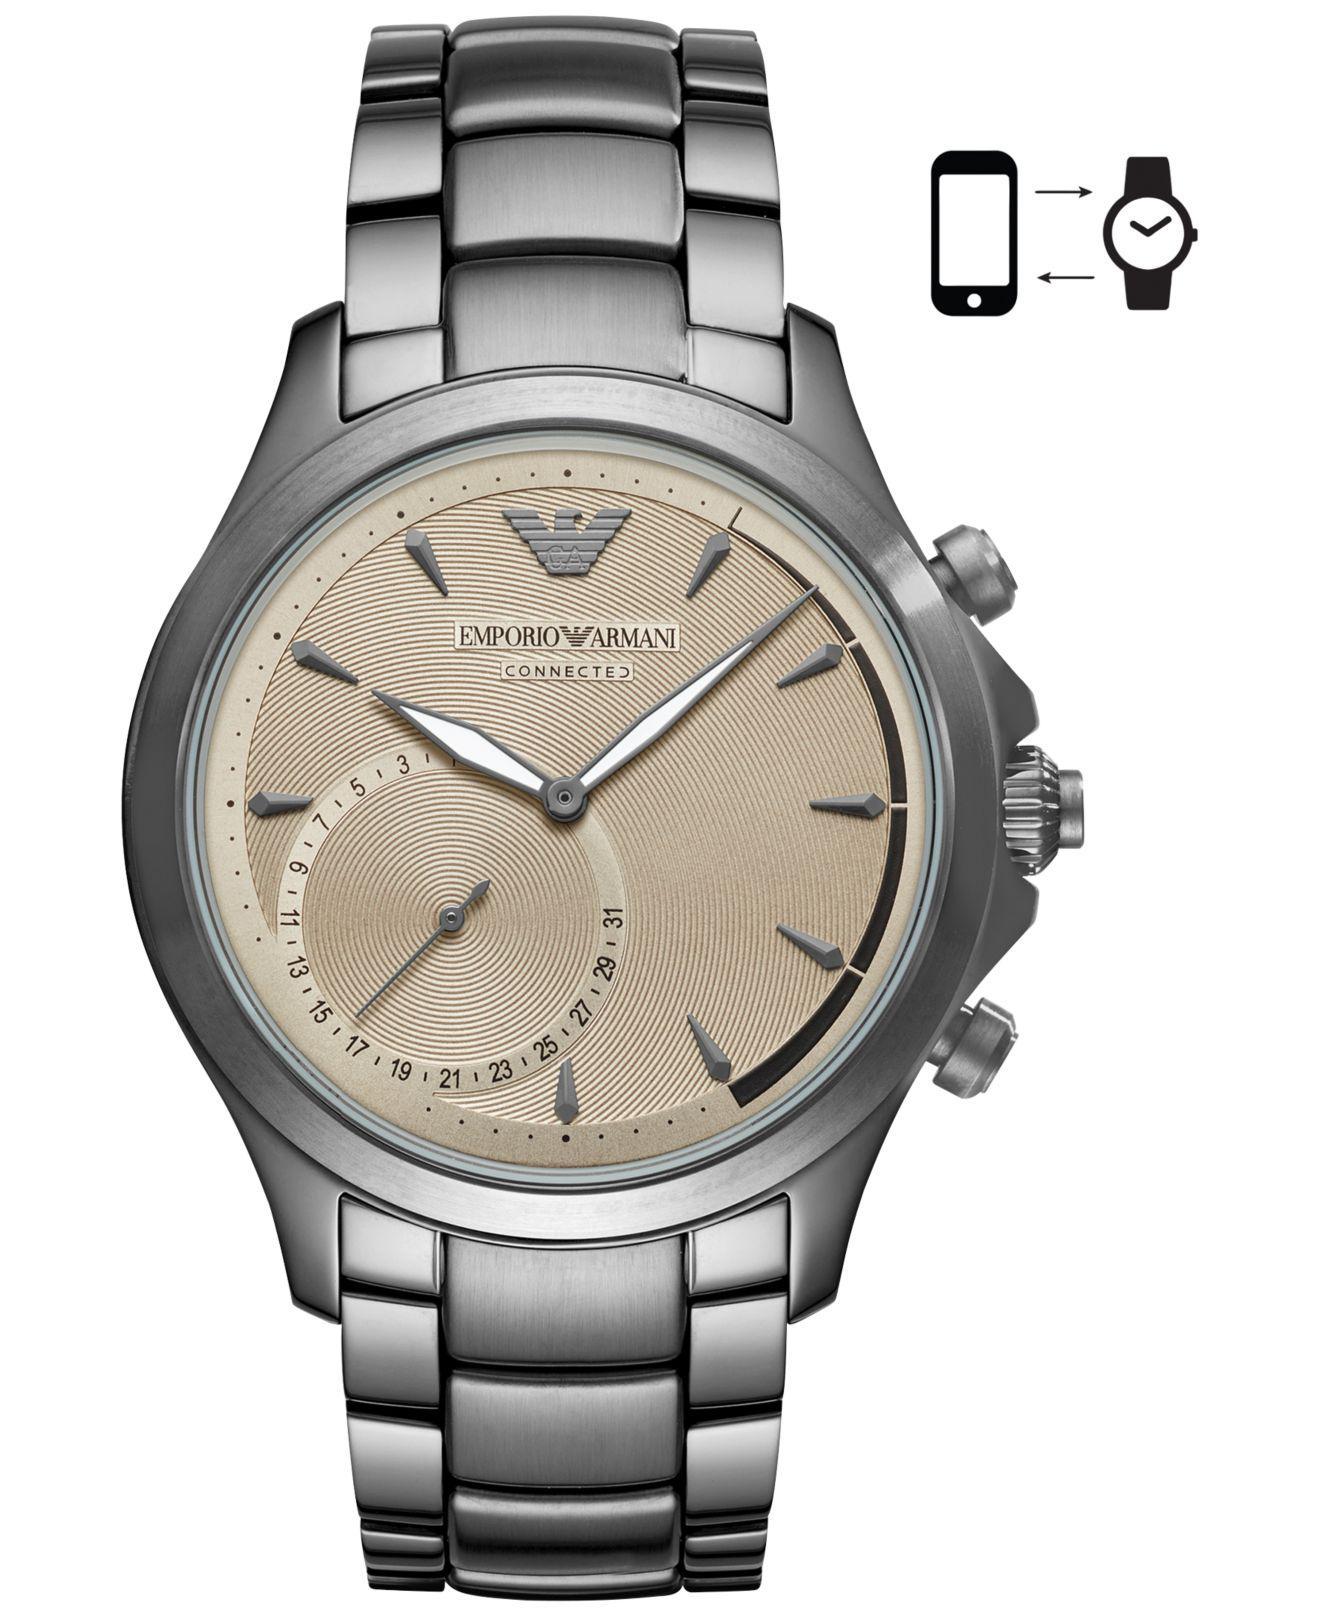 677d9a3d6f1b1 Emporio Armani Metallic Men's Connected Gray Stainless Steel Bracelet Hybrid  Smart Watch 43mm for men. View fullscreen